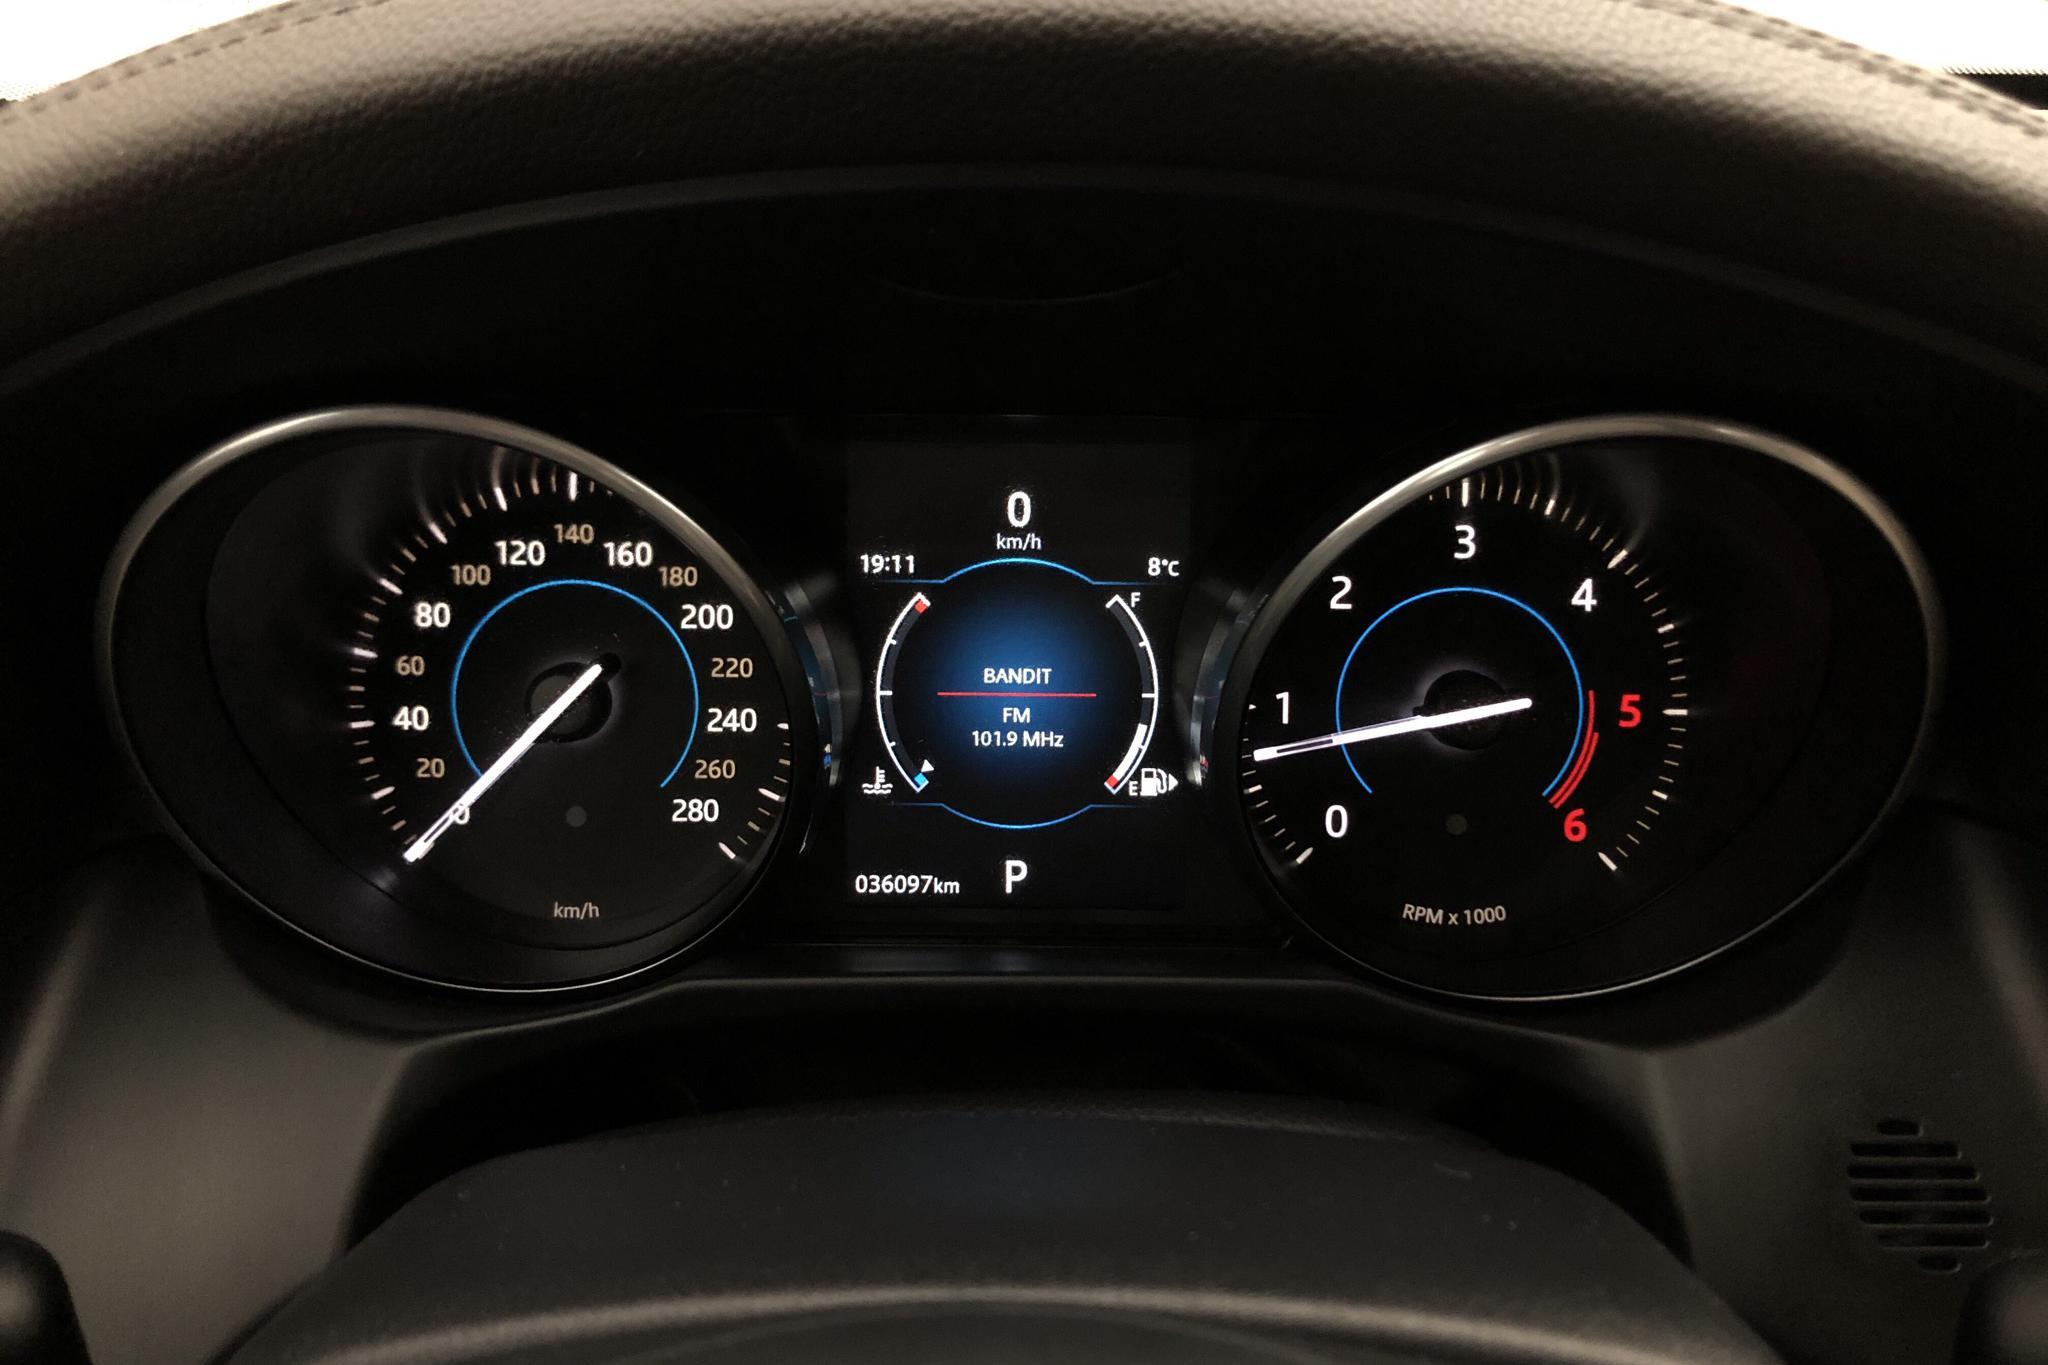 Jaguar XF 2.0D i4 Turbocharged AWD (240hk) - 3 609 mil - Automat - grå - 2018